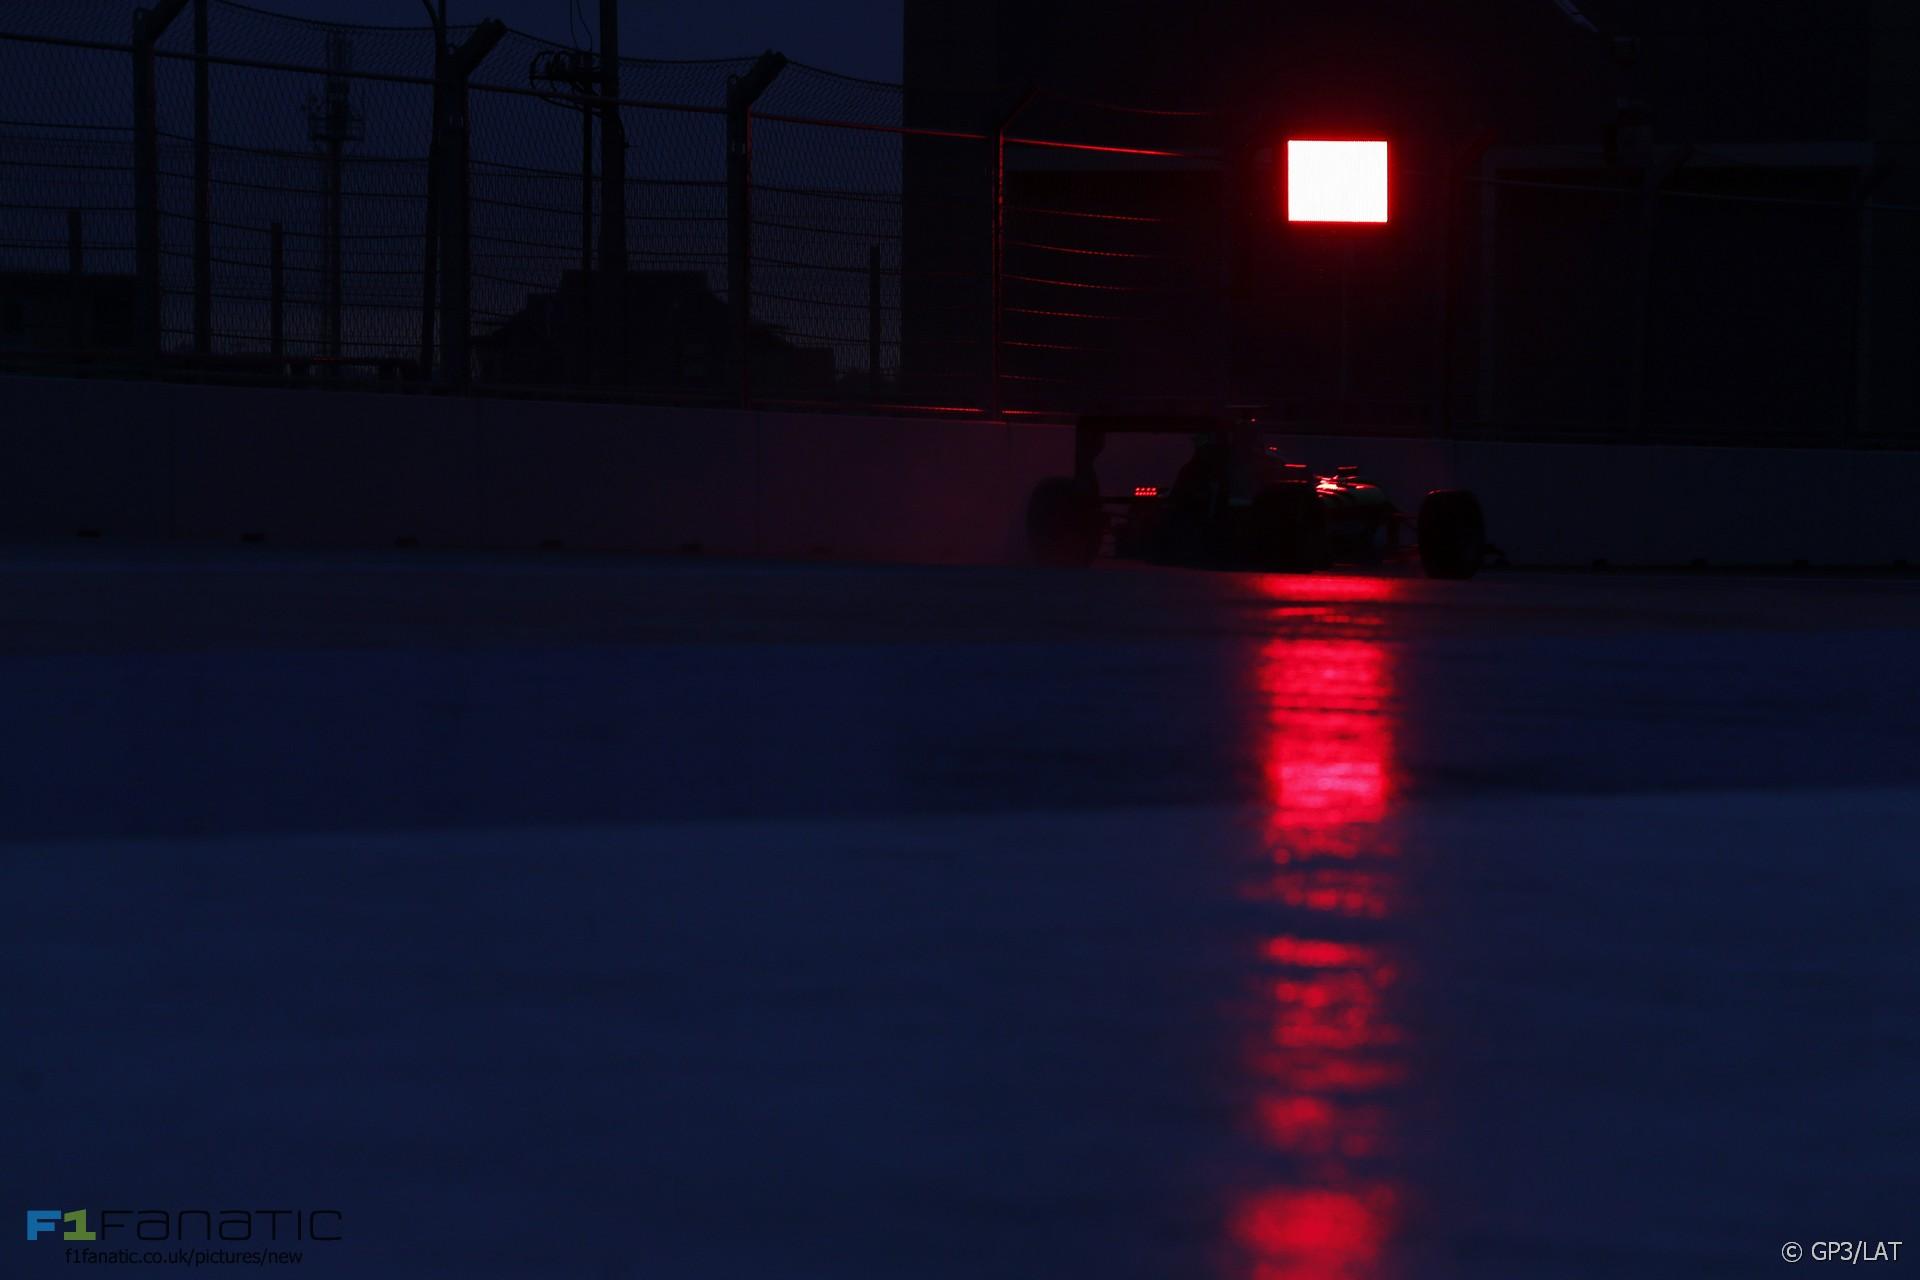 GP3, Sochi Autodrom, 2015